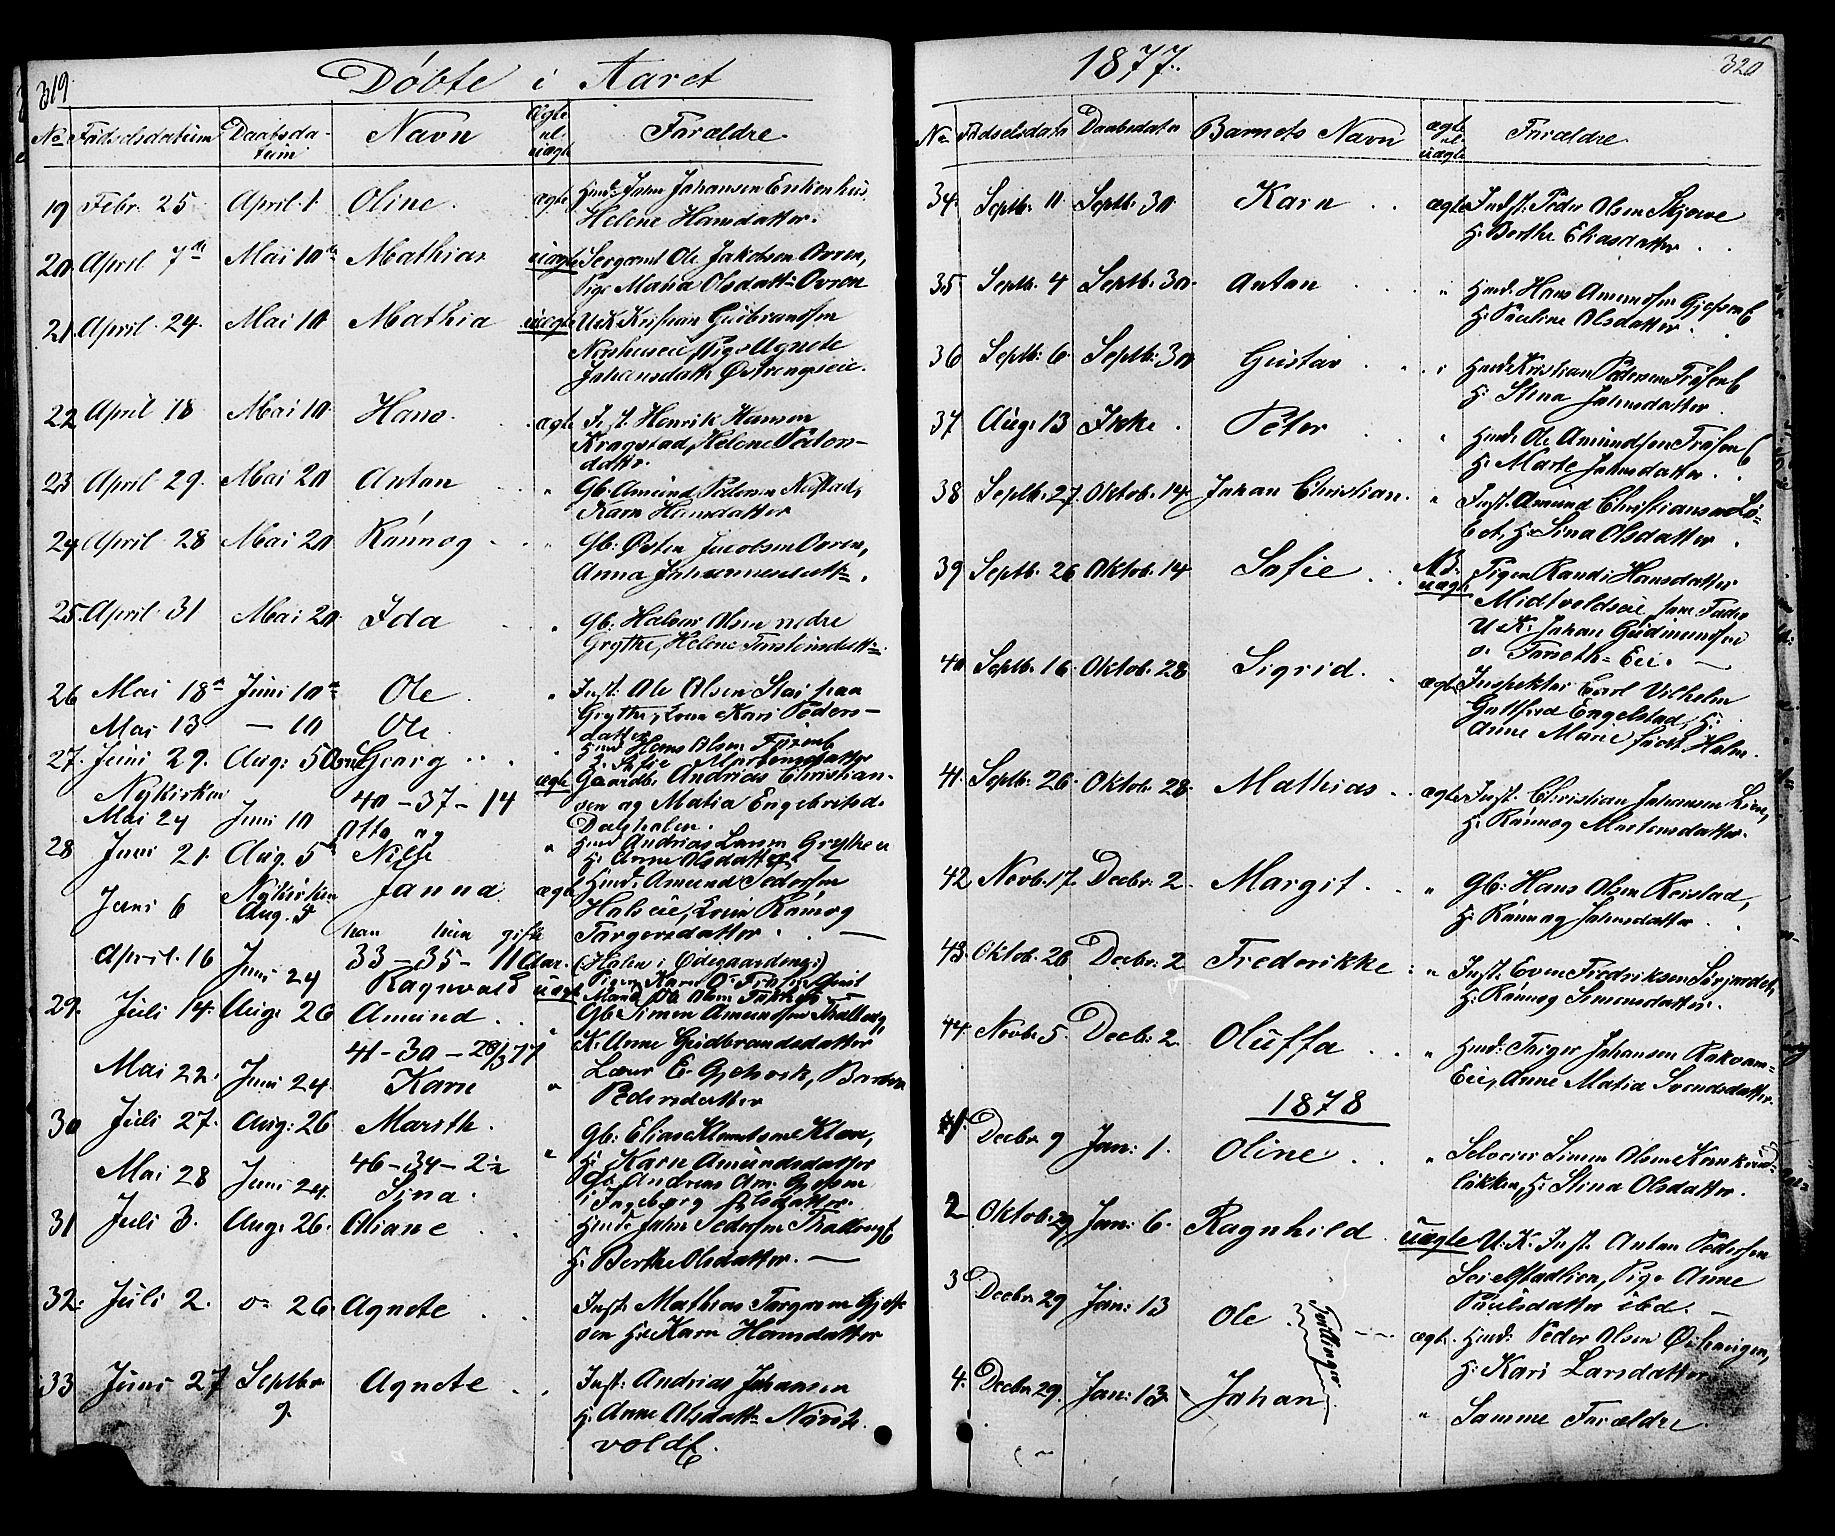 SAH, Østre Gausdal prestekontor, Klokkerbok nr. 1, 1863-1893, s. 319-320